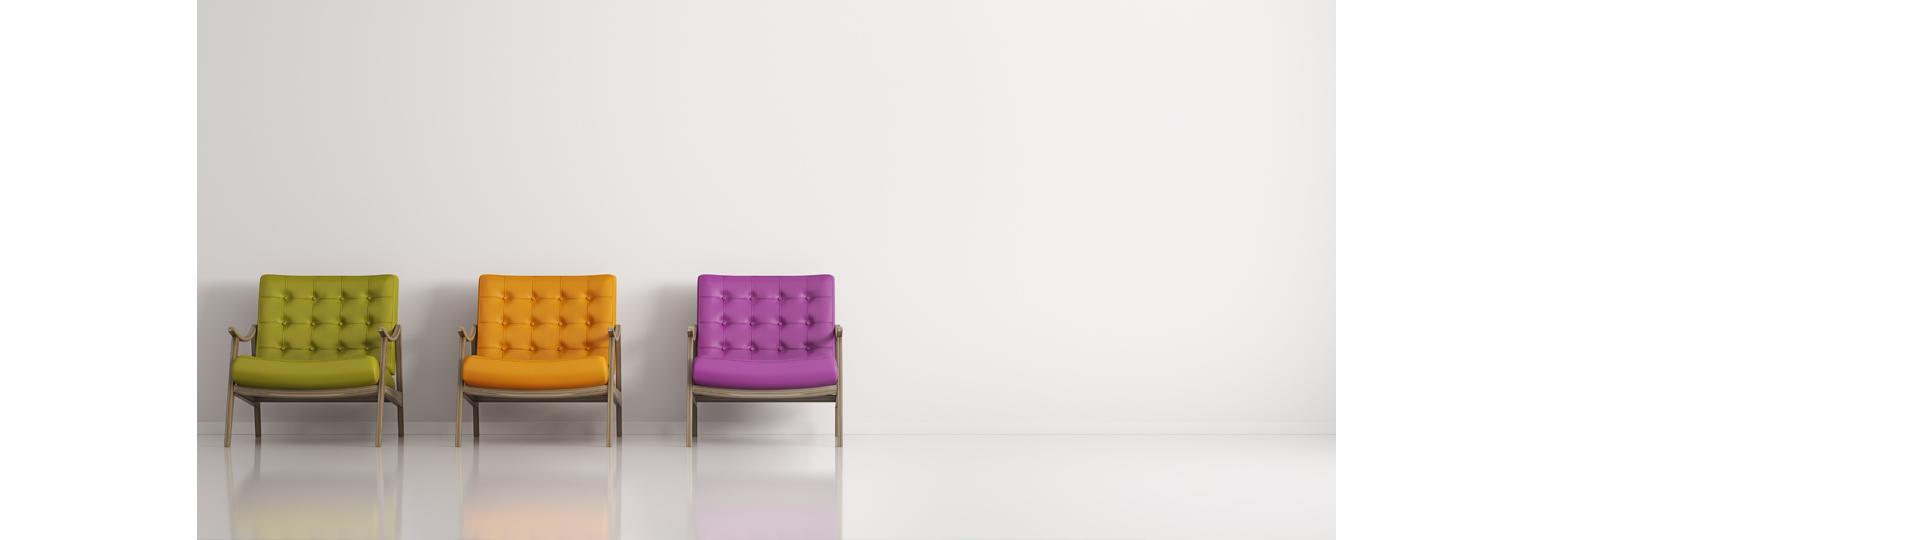 trój kolorowe fotele